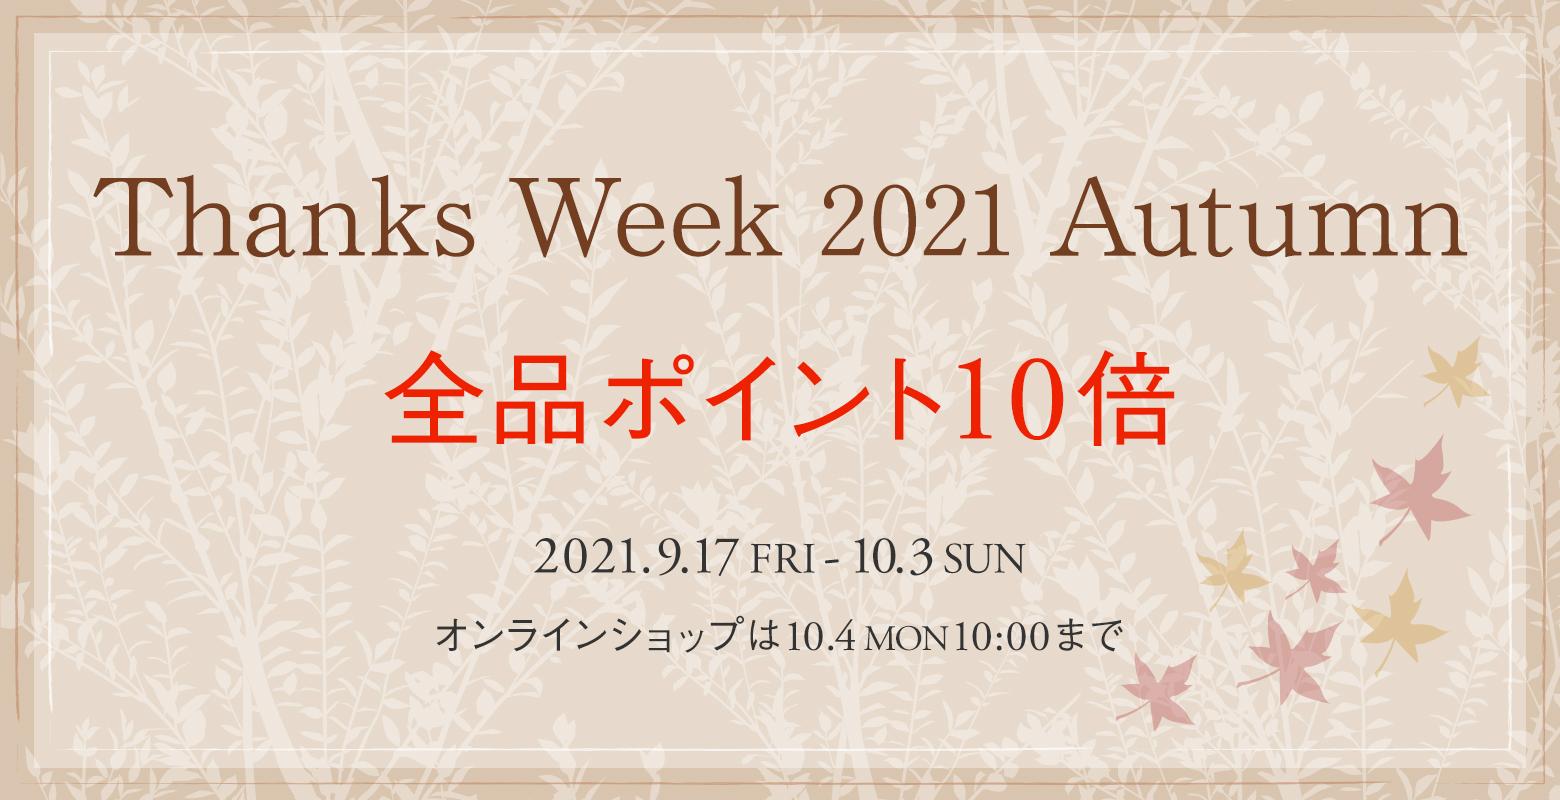 Thanks Week 2021 Autumn